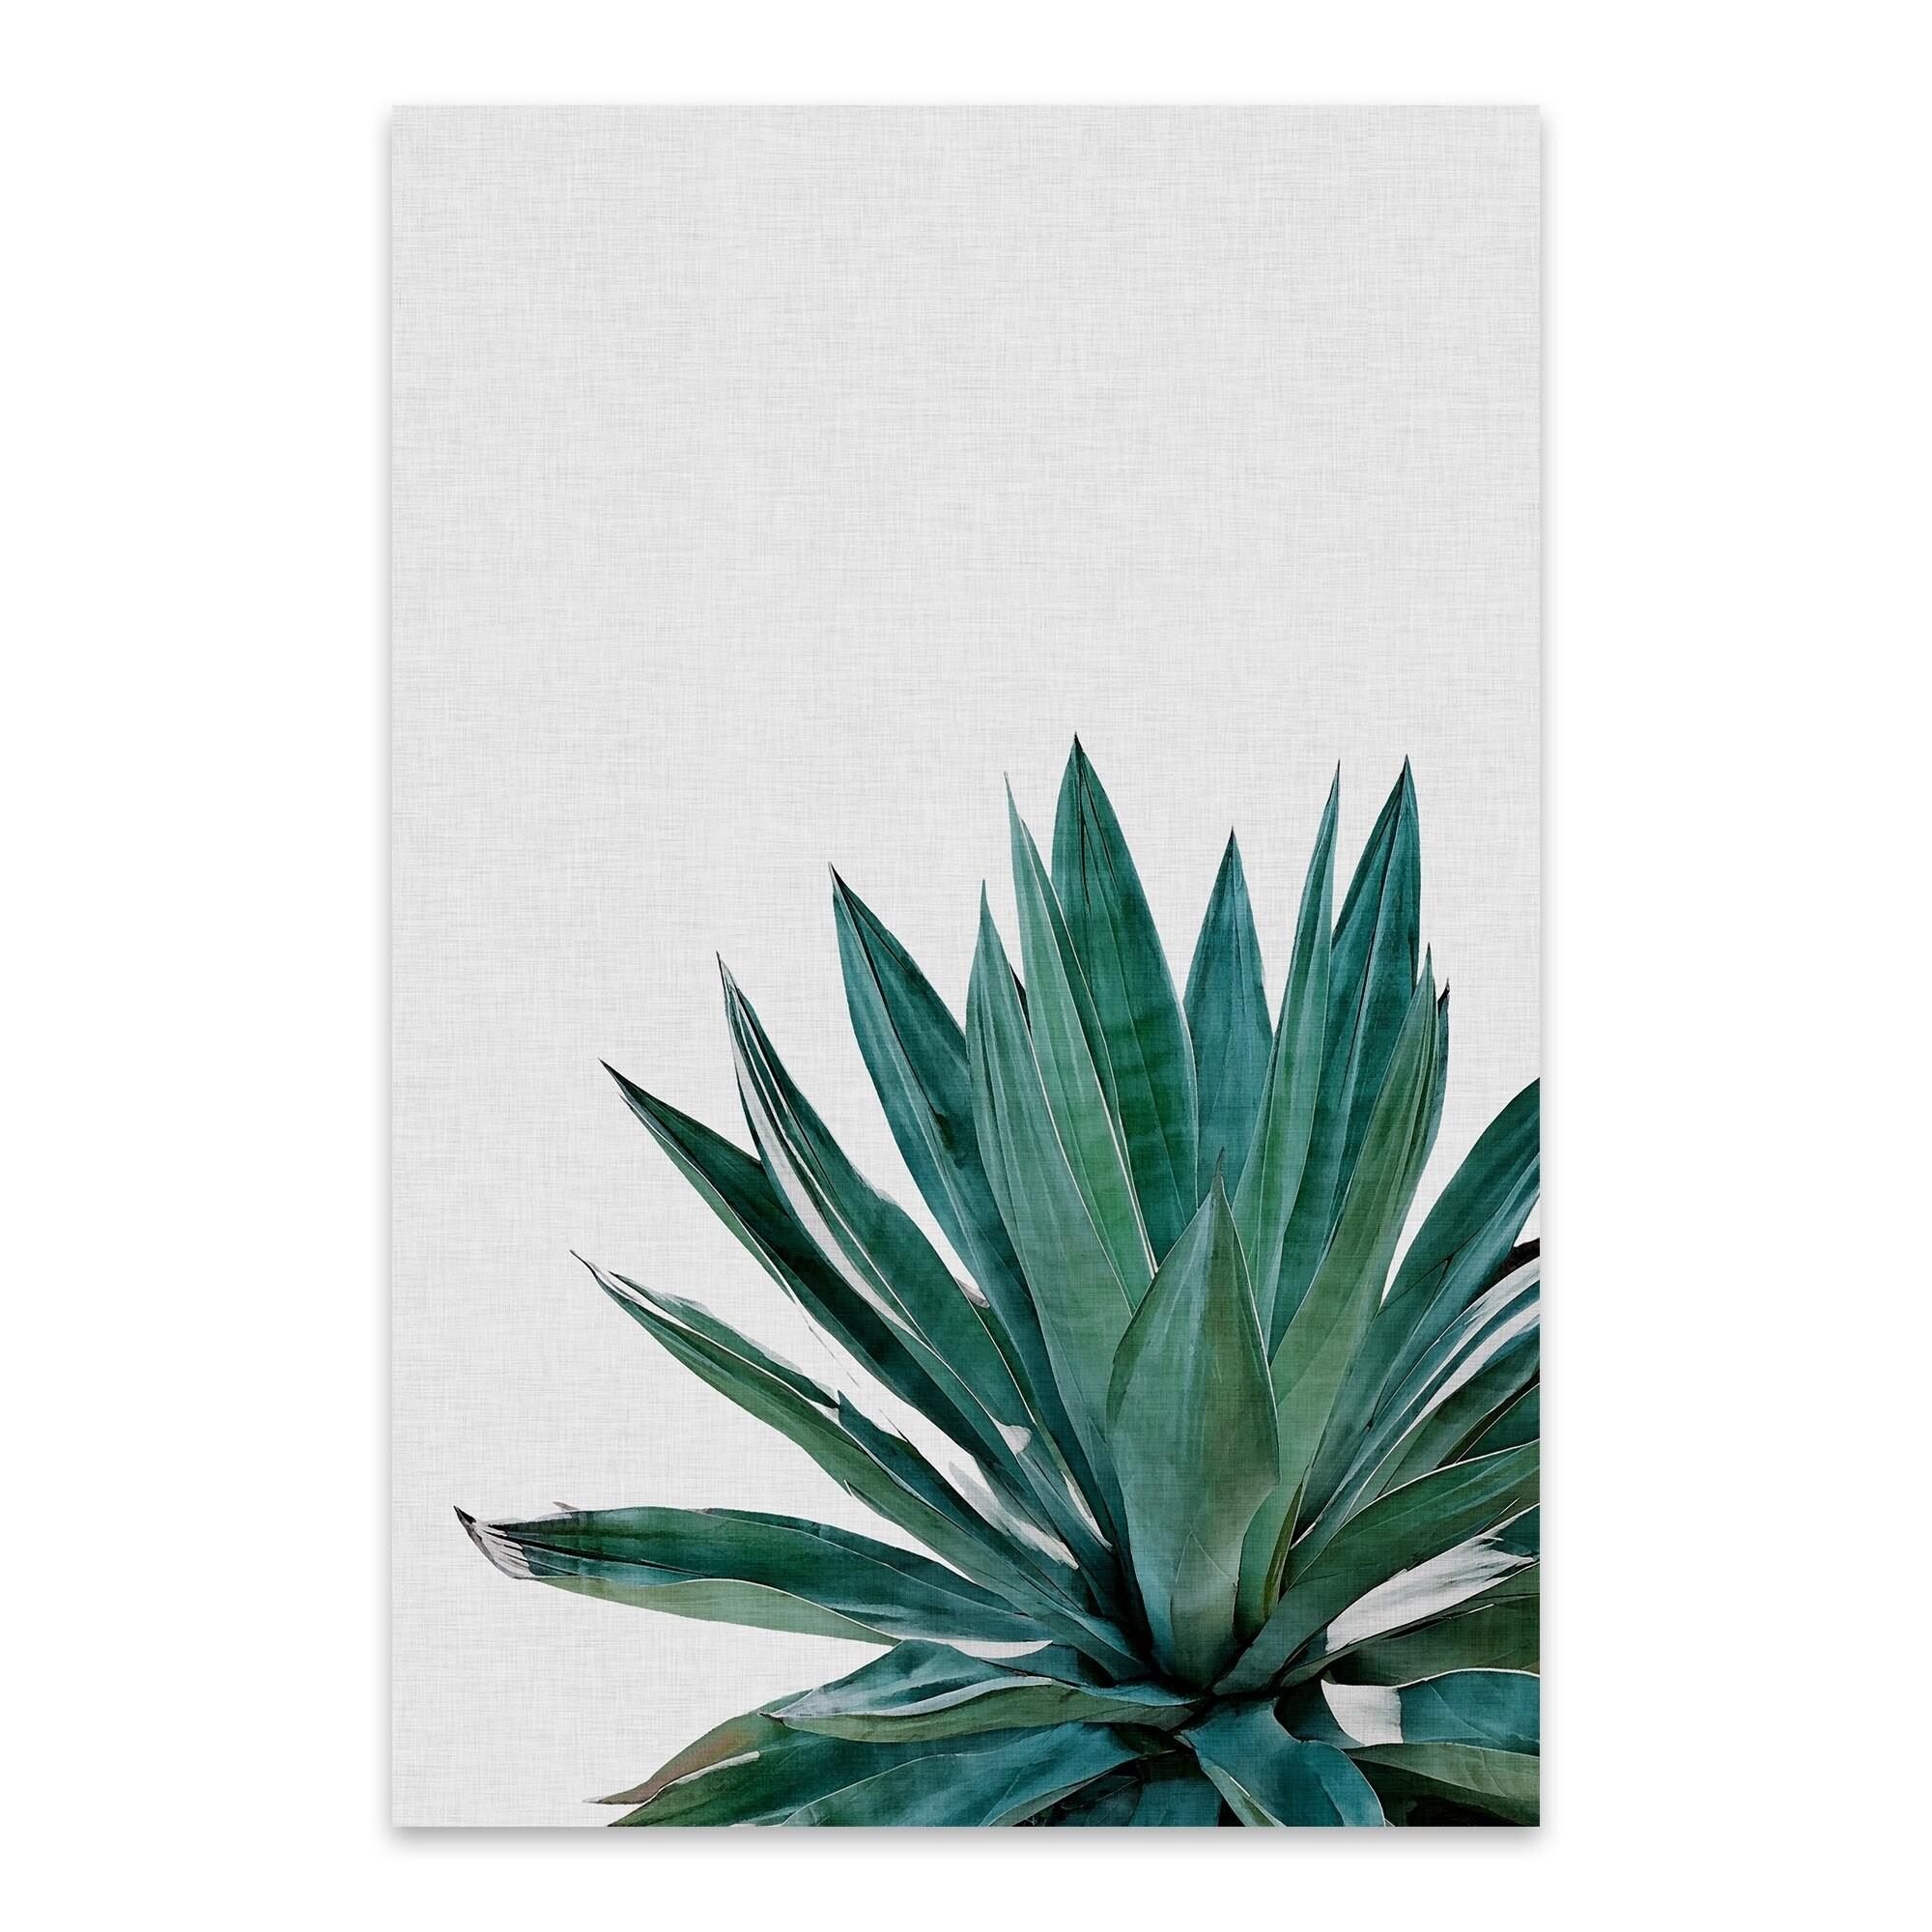 Shop Noir Gallery Orara Studio Agave Cactus Agave Plant Floral